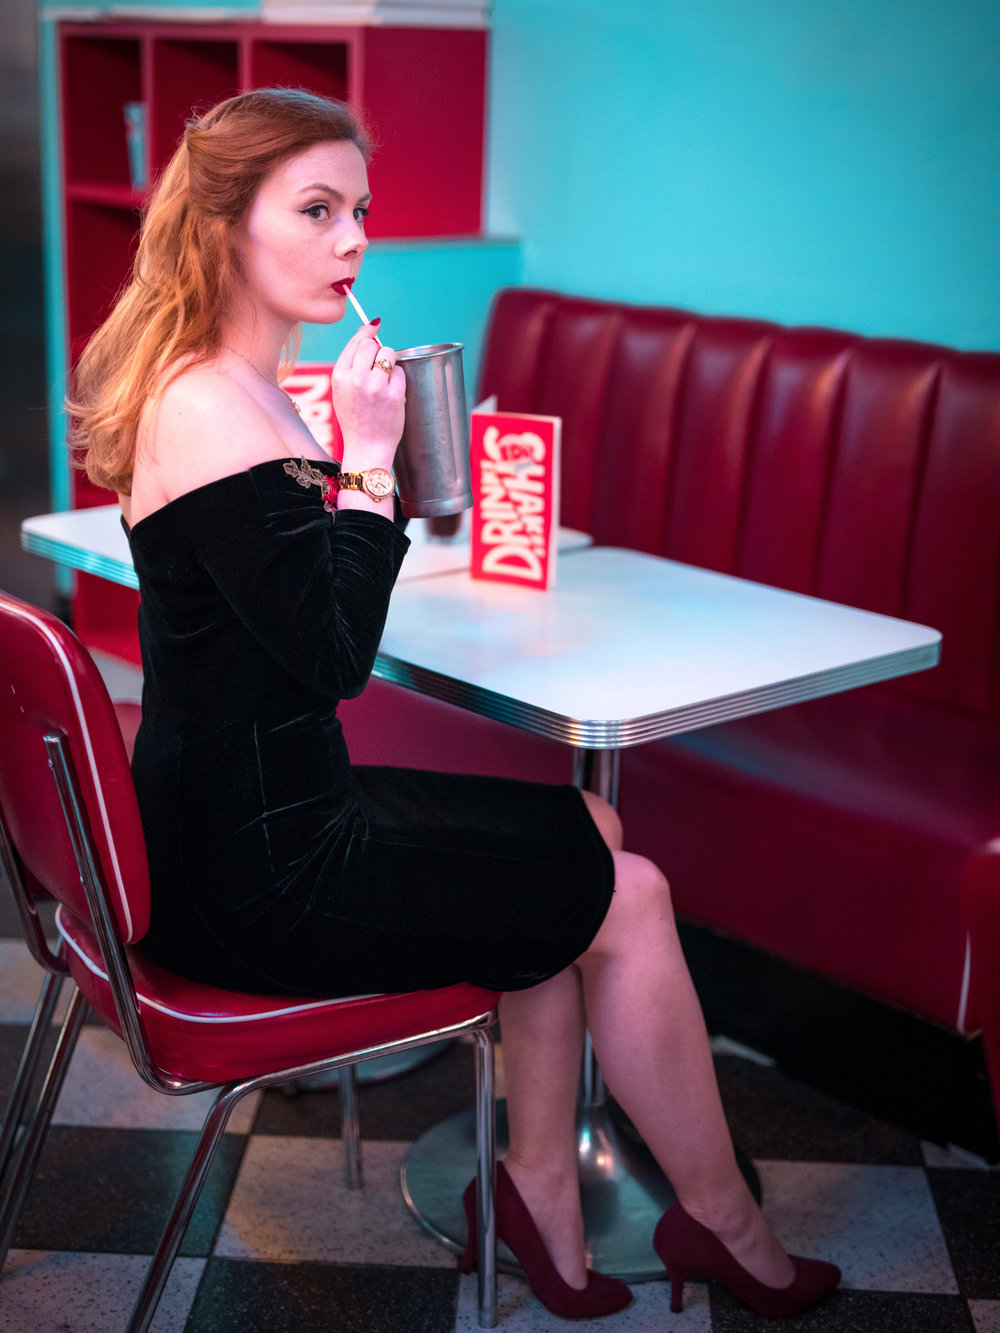 1950s Diner Portrait Eye Catching Milkshake